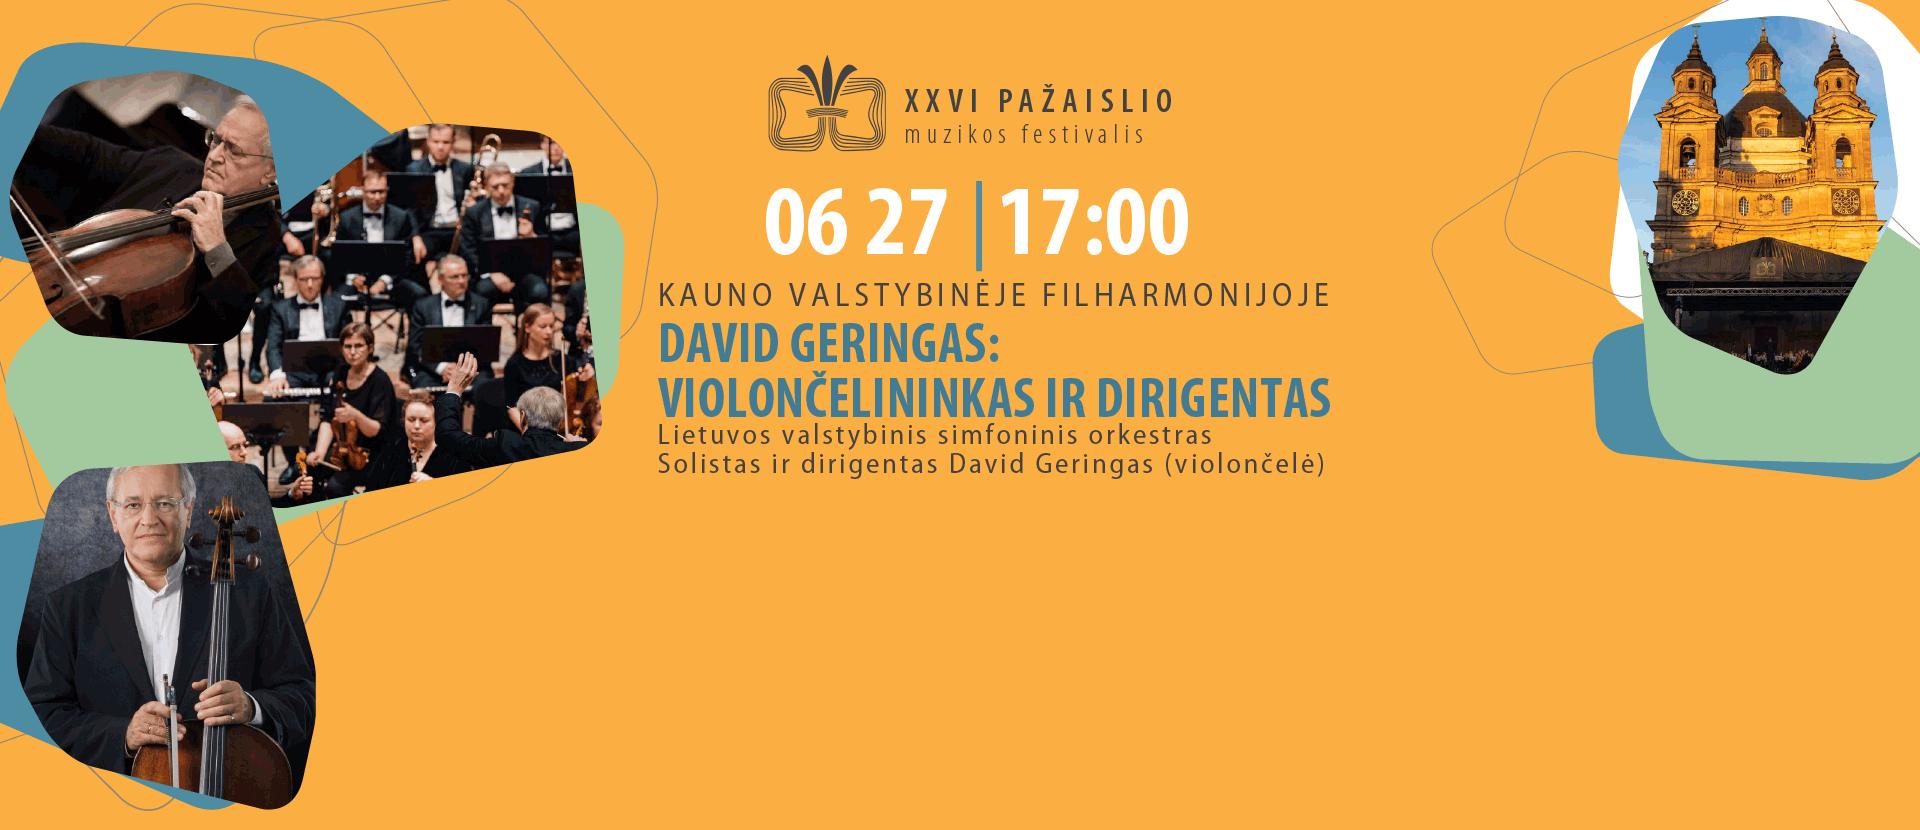 XXVI Pažaislio muzikos festivalis DAVIDAS GERINGAS: VIOLONČELININKAS IR DIRIGENTAS